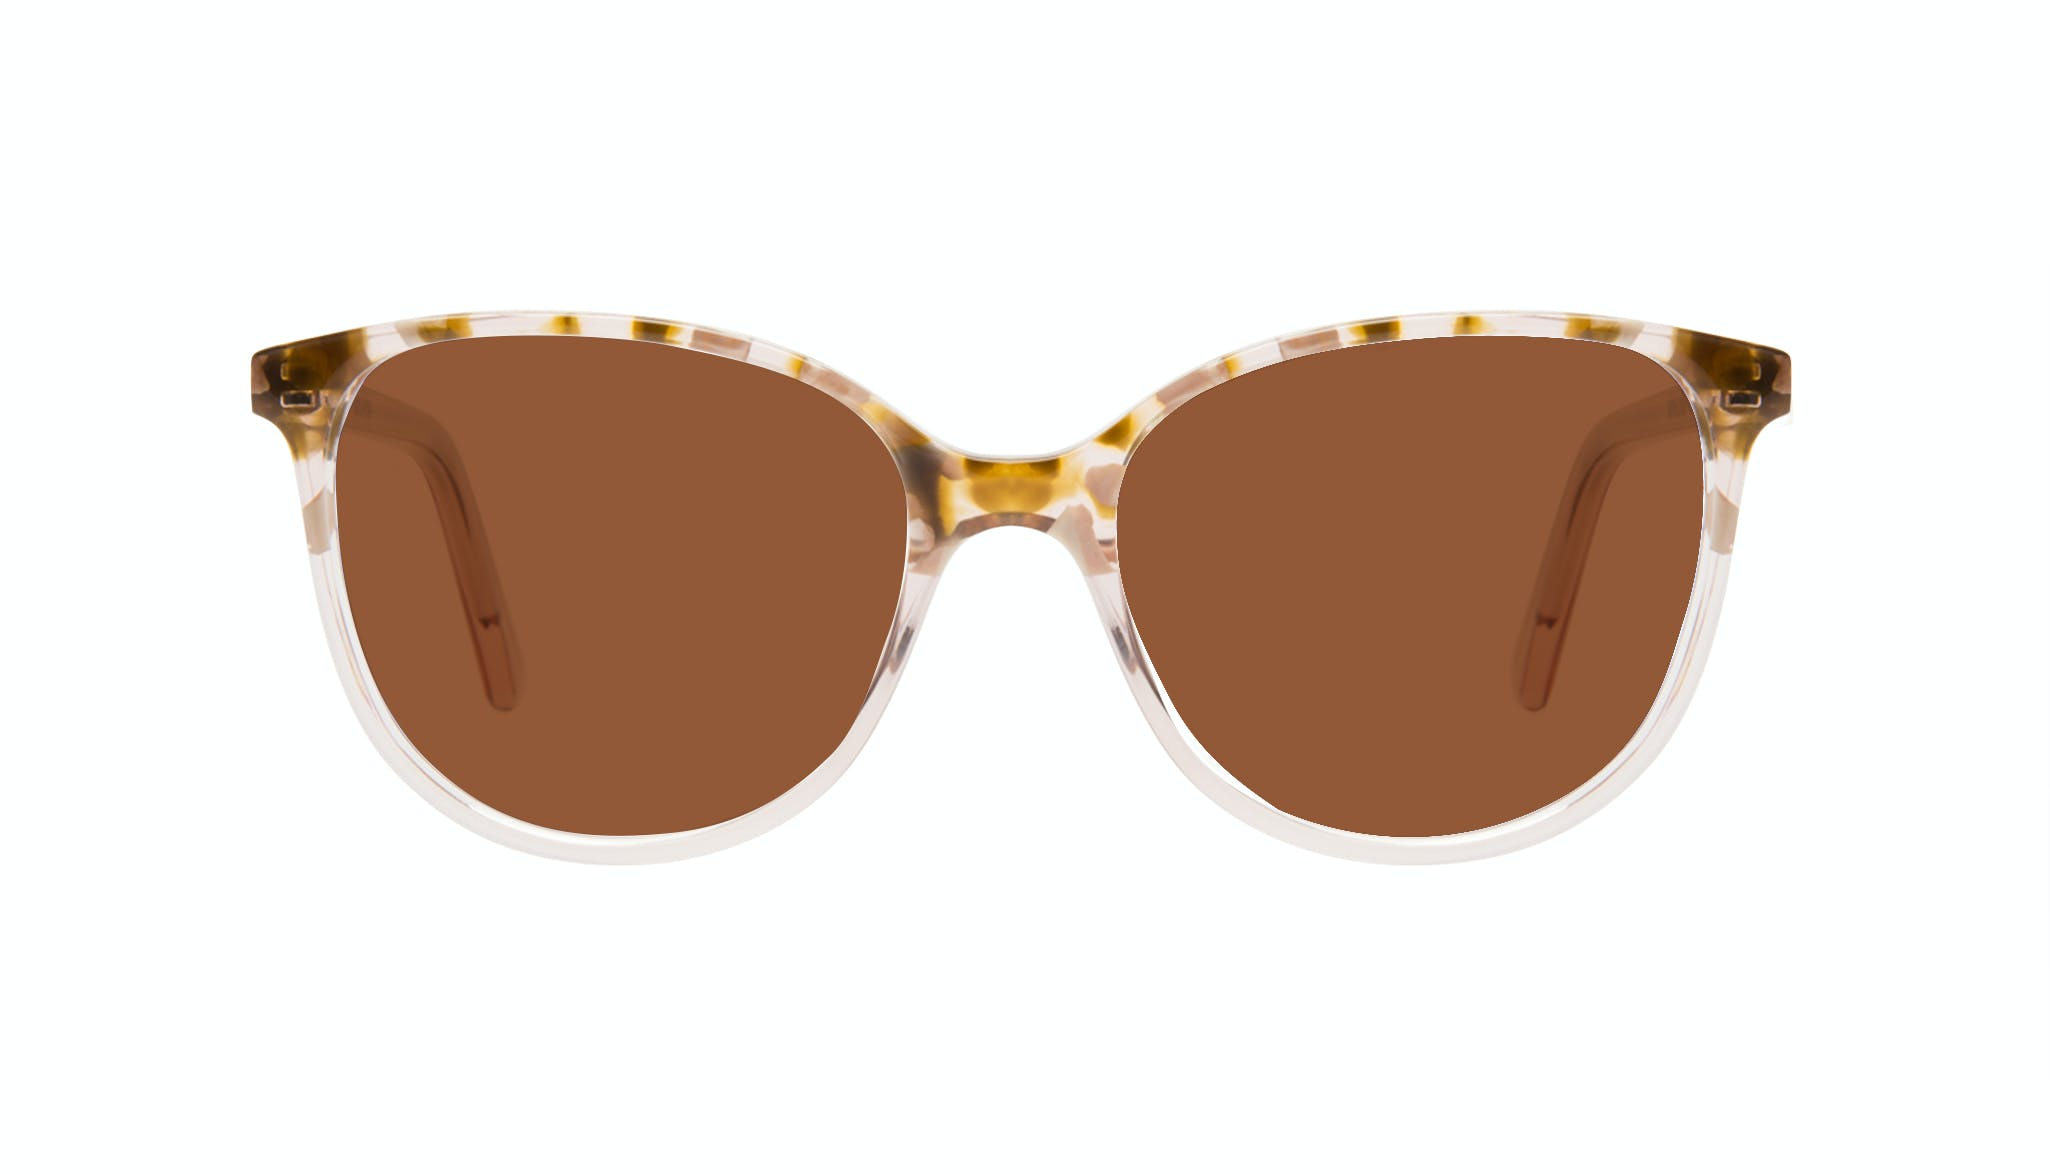 Affordable Fashion Glasses Cat Eye Sunglasses Women Imagine Petite Rose Flake